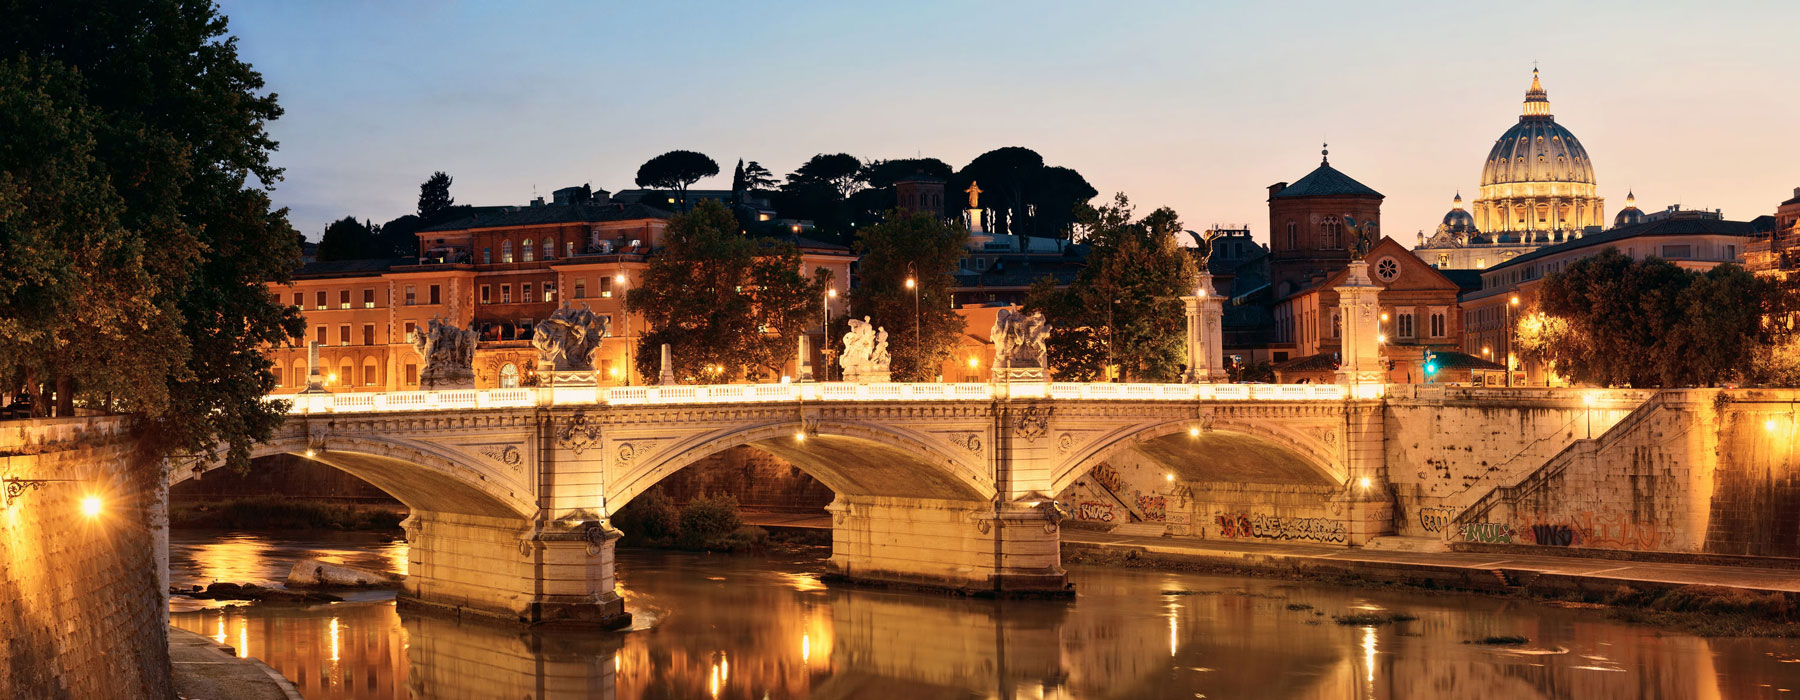 Roma_15.jpg